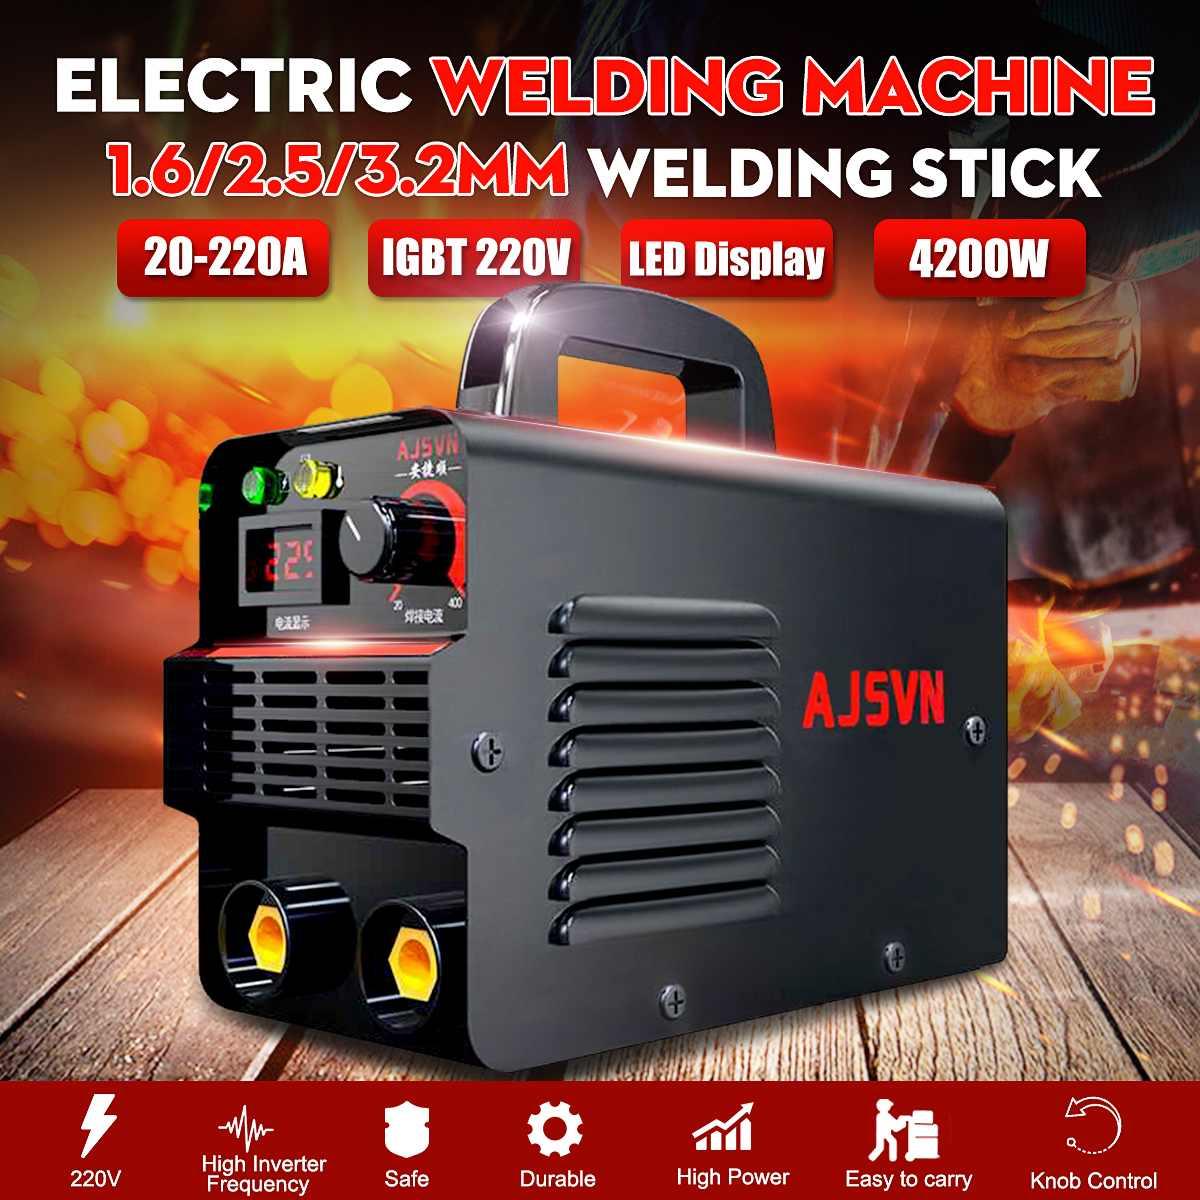 New Display Tool IGBT Inverter Adjustable Arc Mini 225A 4200W Digital Welding Handheld Portable Welder 20A Machine 220V Welding